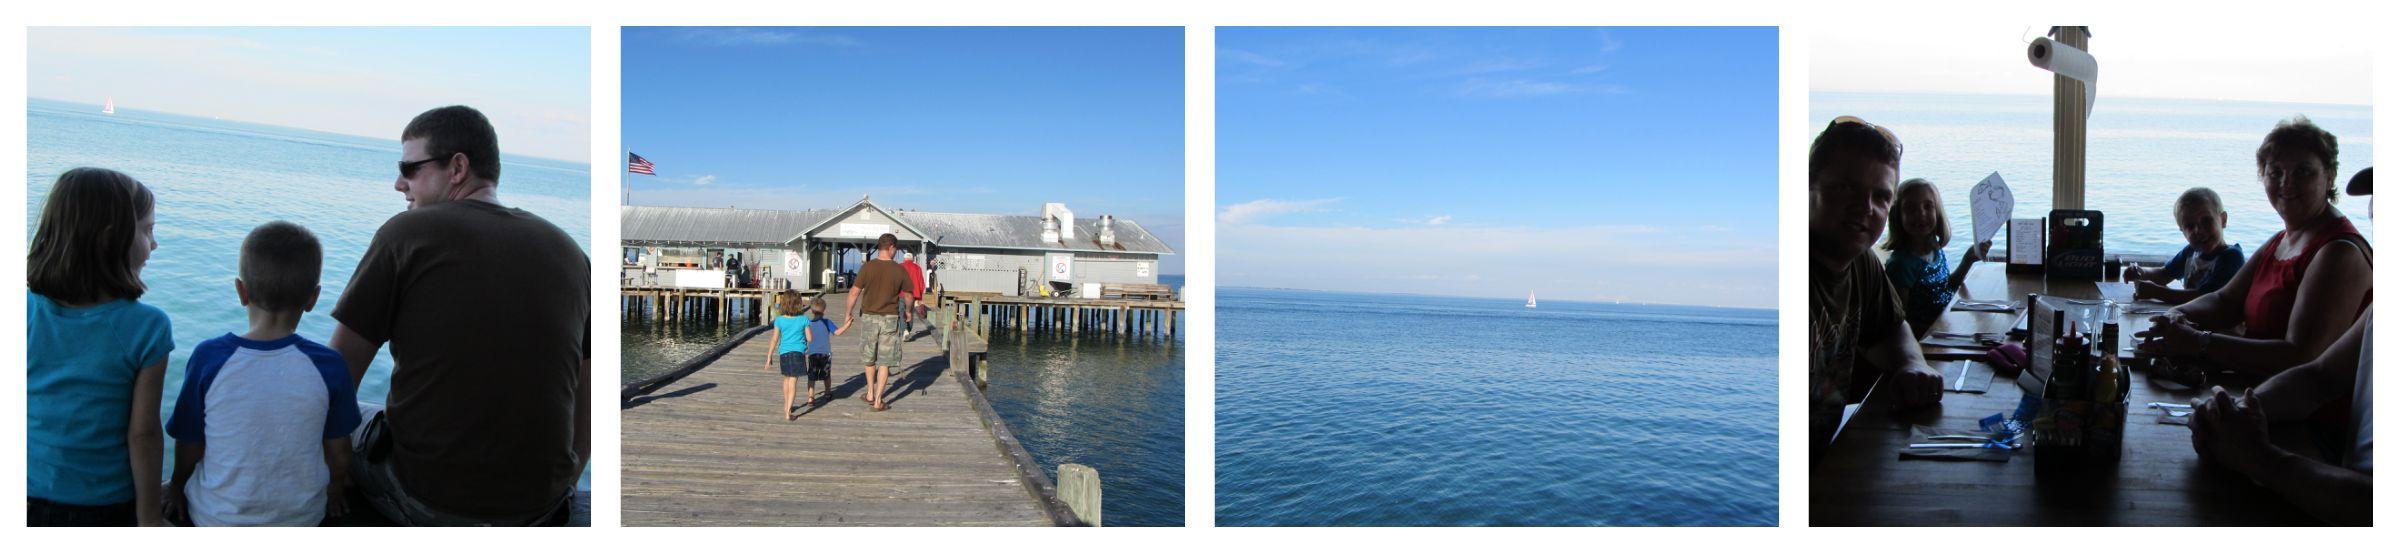 Pier restaurant Anna Maria Island